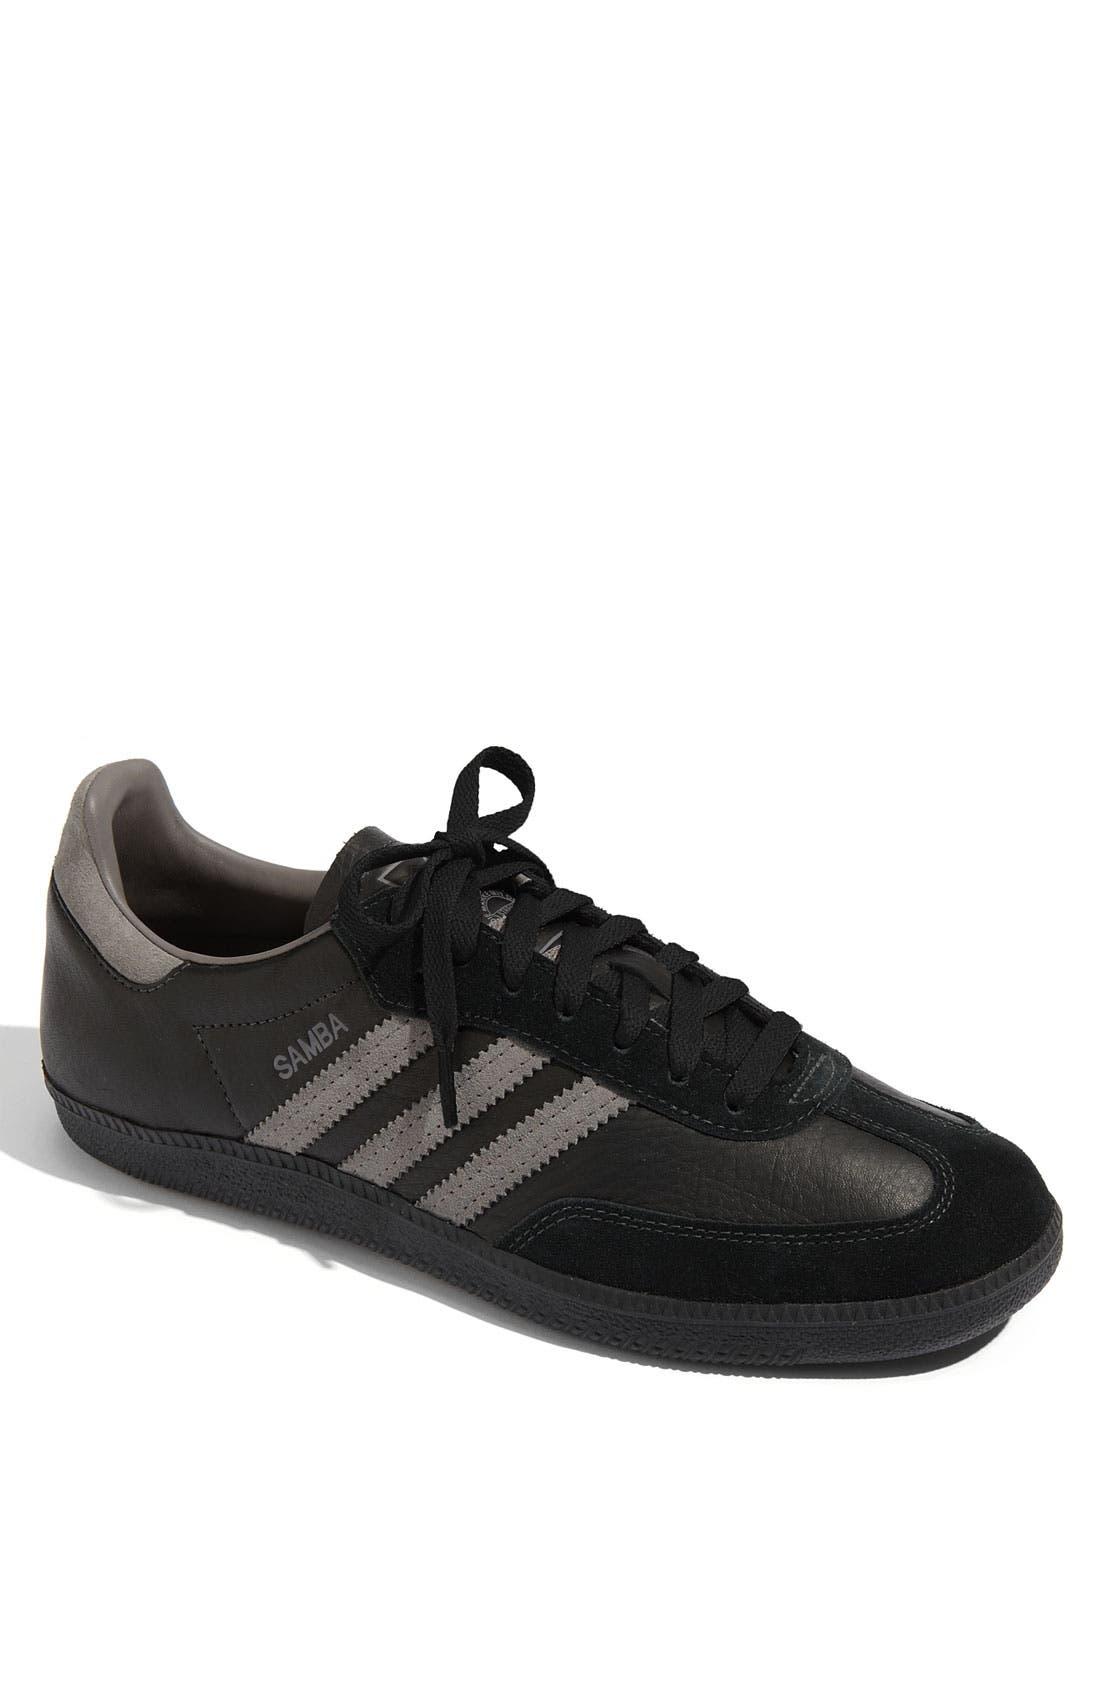 Alternate Image 1 Selected - adidas 'Samba' Sneaker